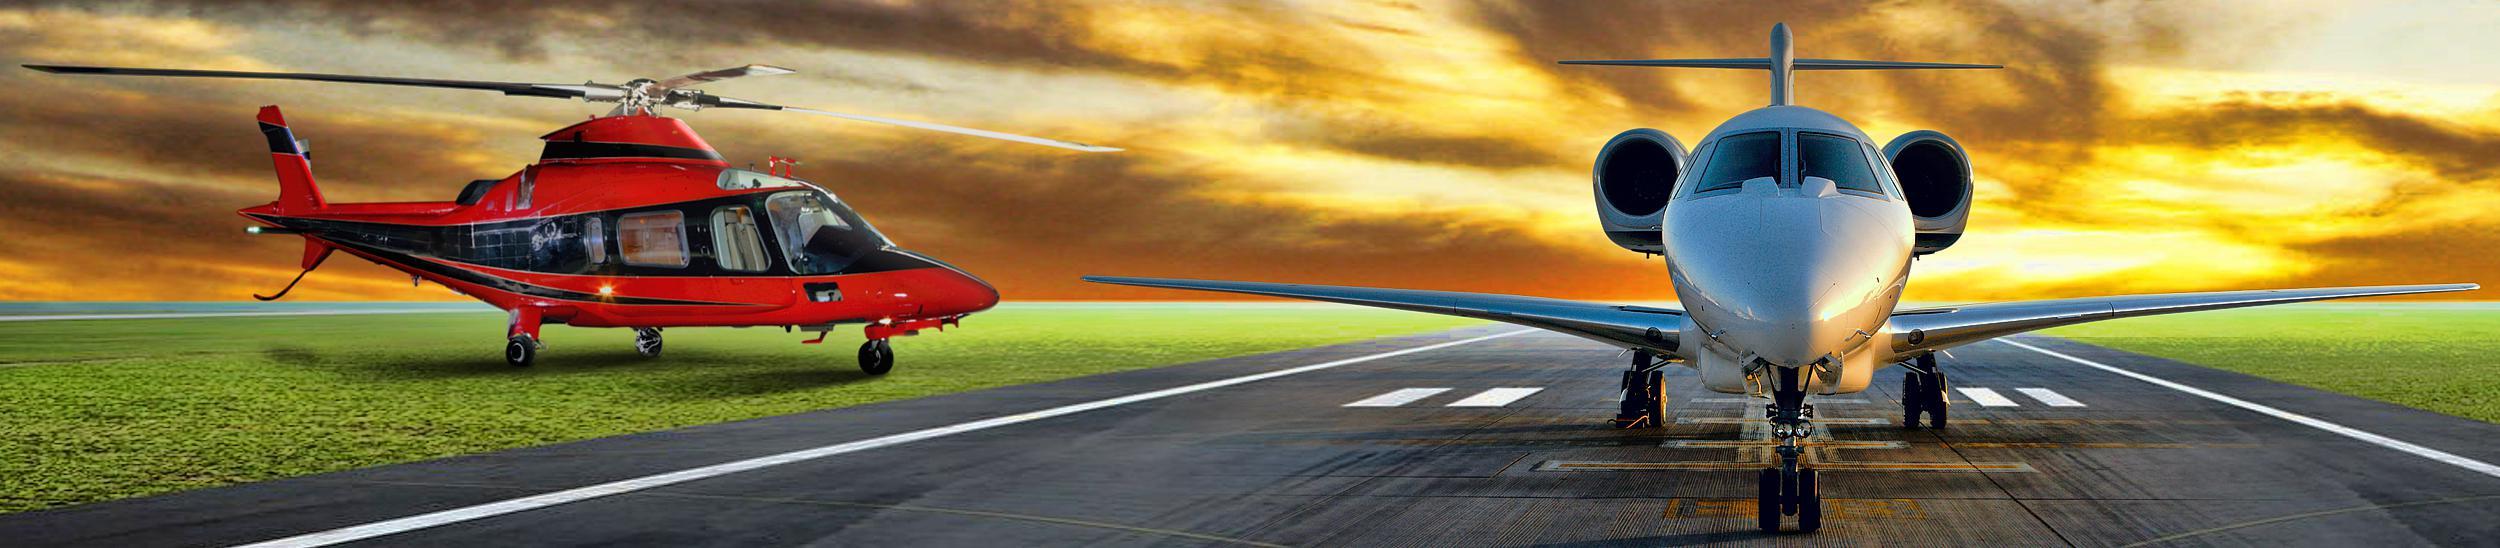 Jet Privato Treviso : Noleggio jet privato i prezzi ▷ jet app